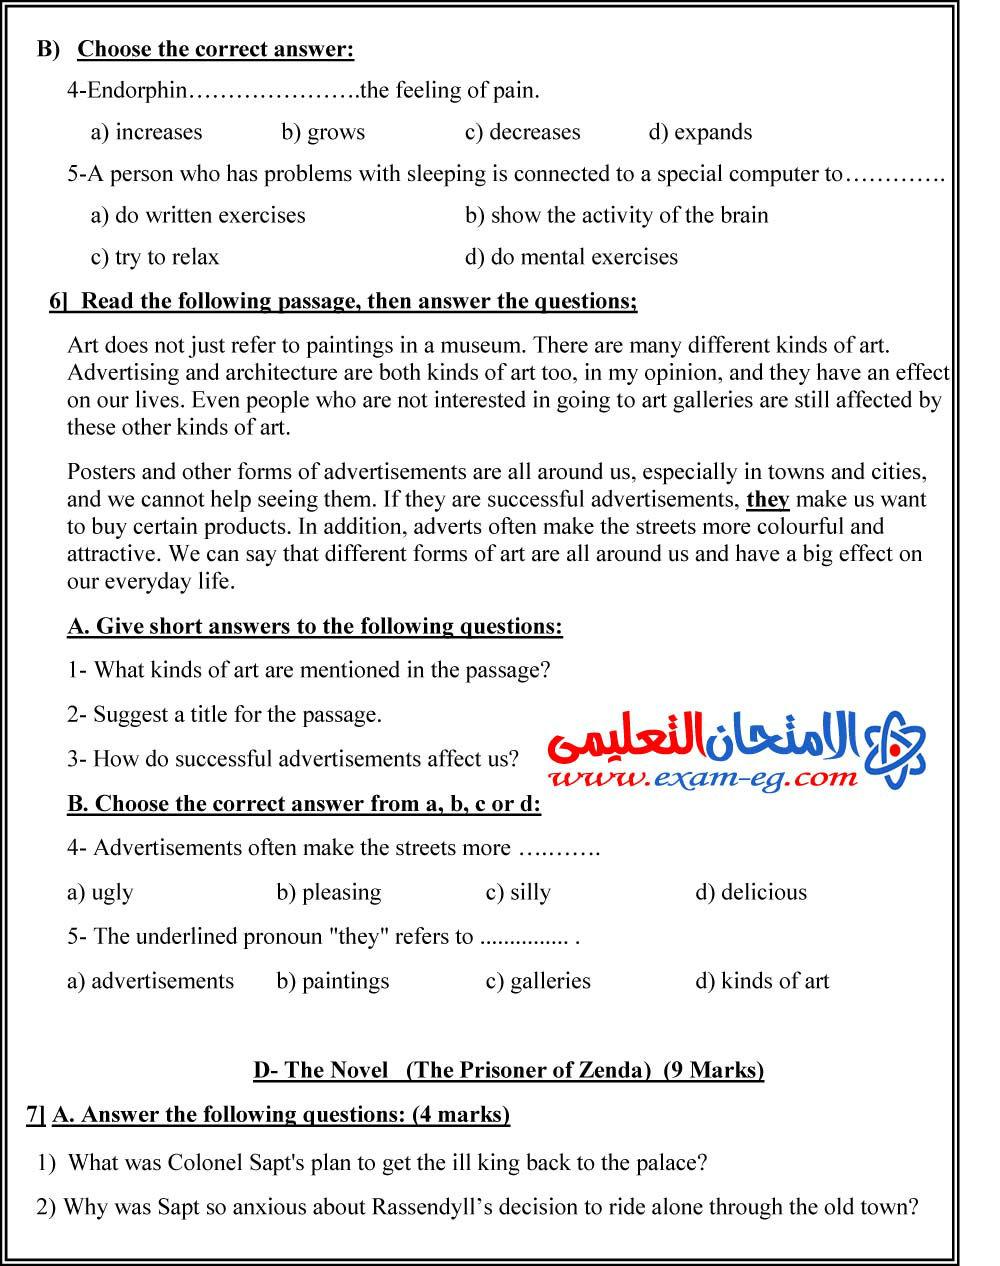 exam-eg.com_139662271884.jpg